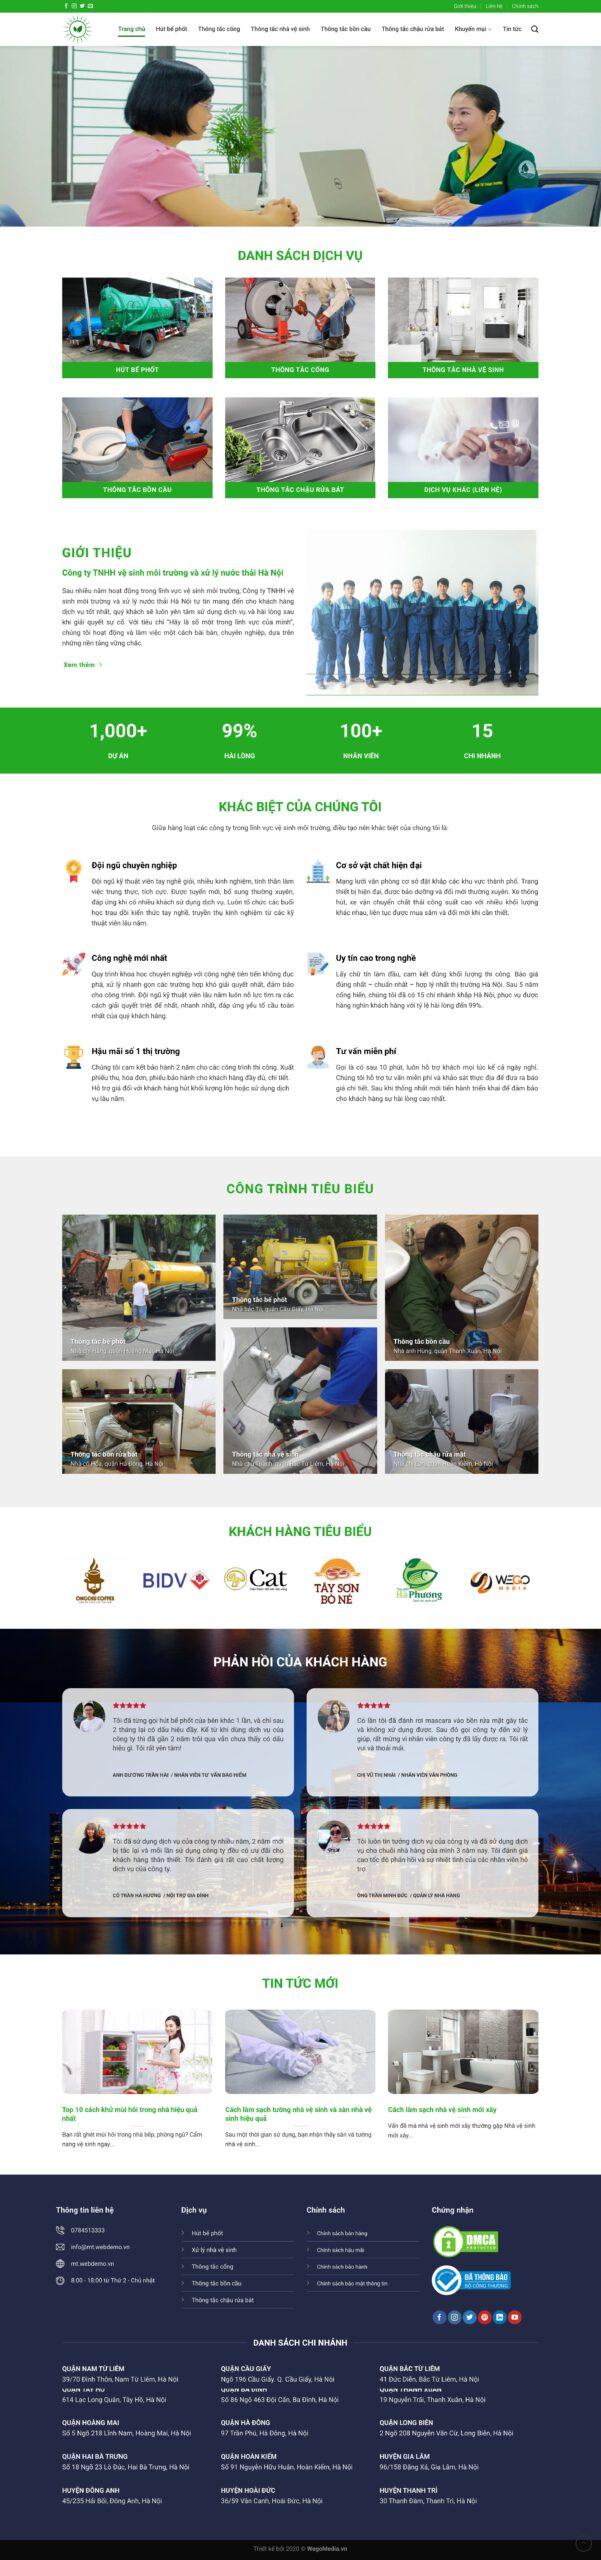 thongtaccong.info.vn